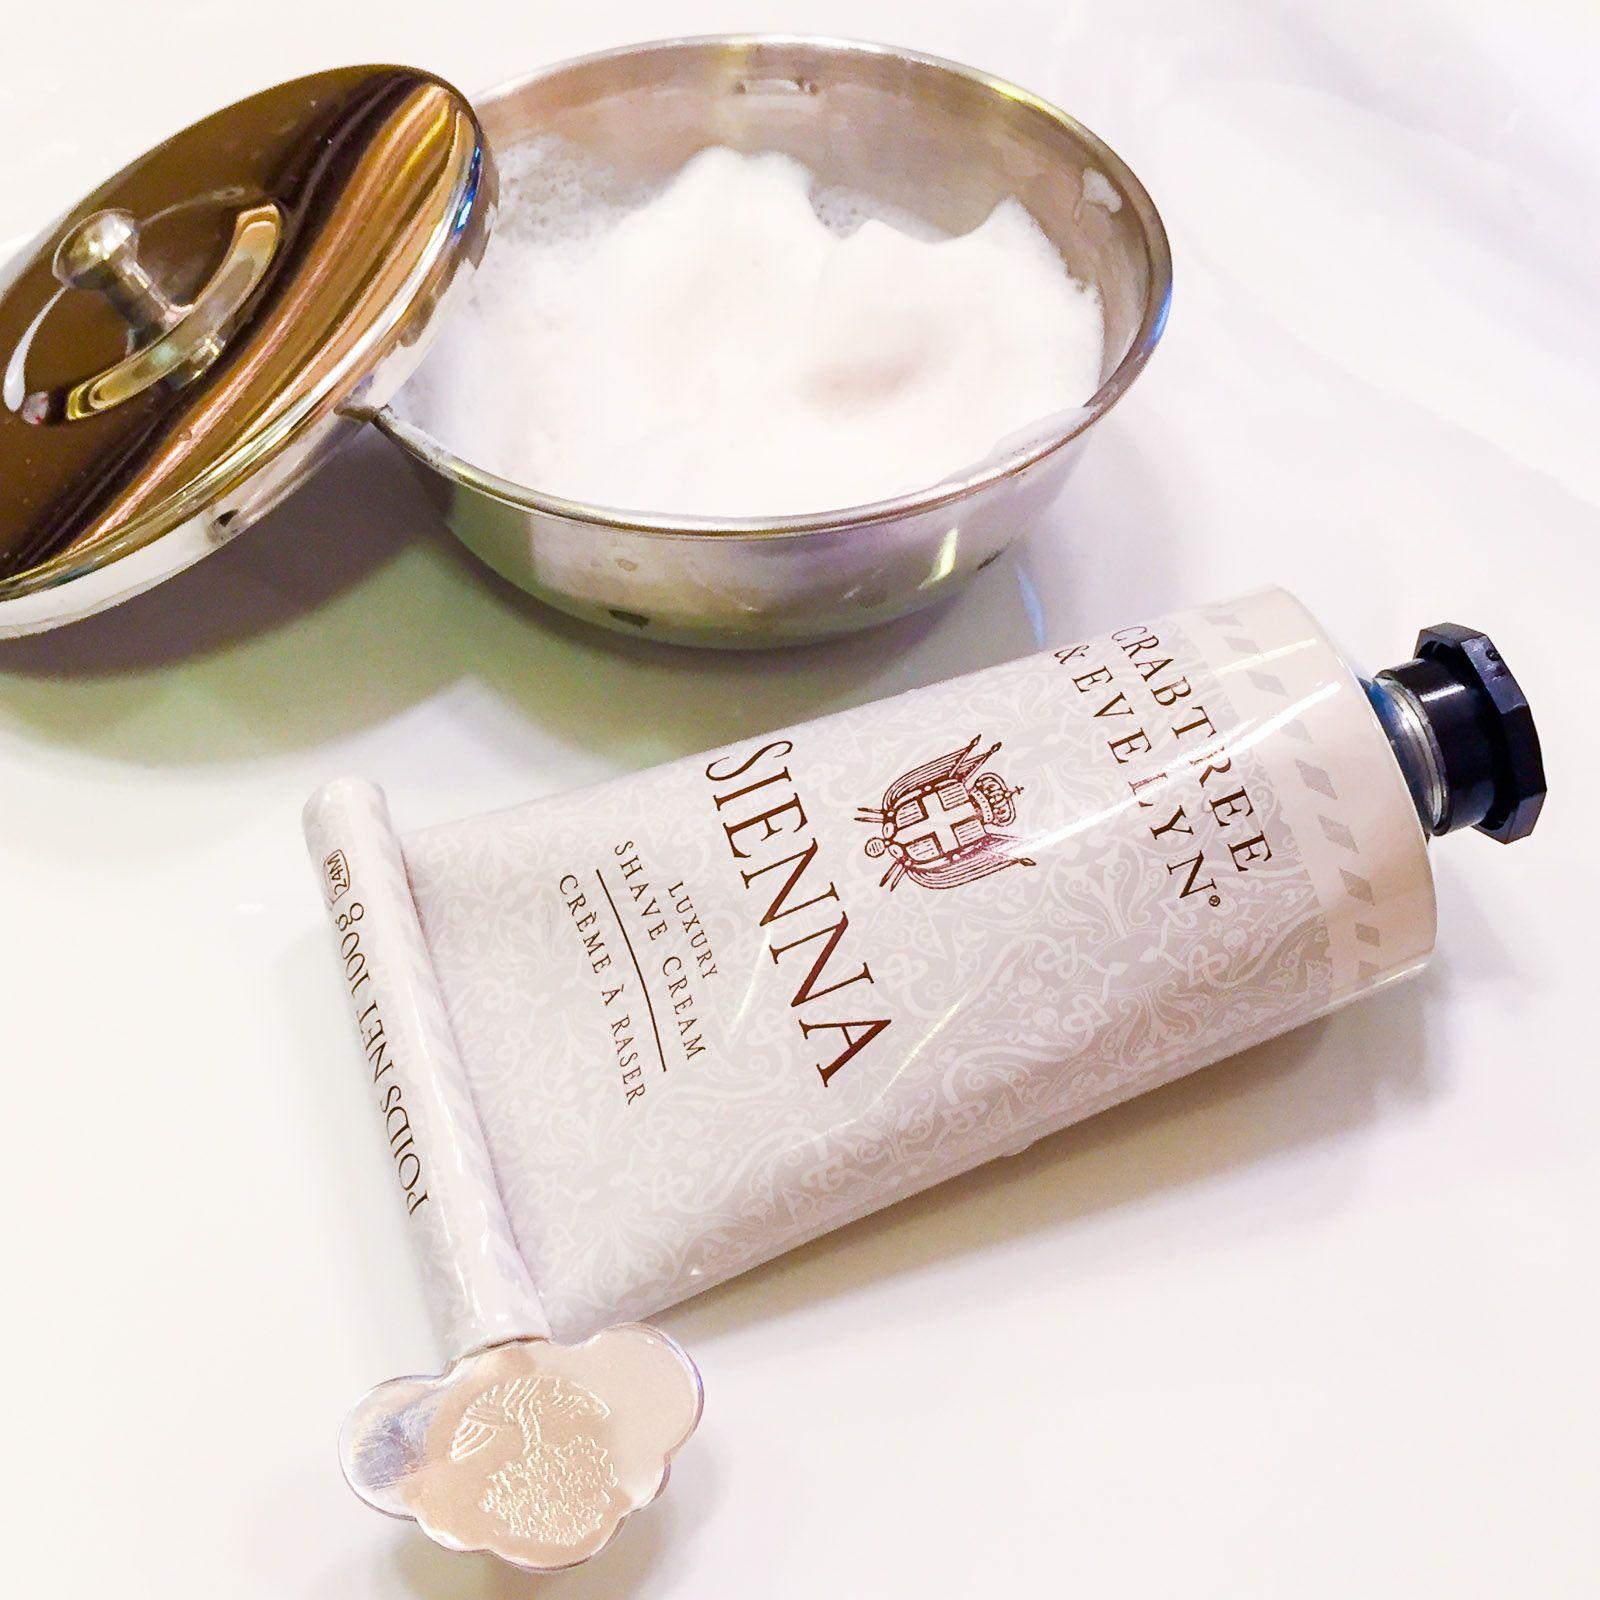 You are currently viewing Crabtree & Evelyn Sienna Luxury Shaving Cream – recenzja kremu do golenia